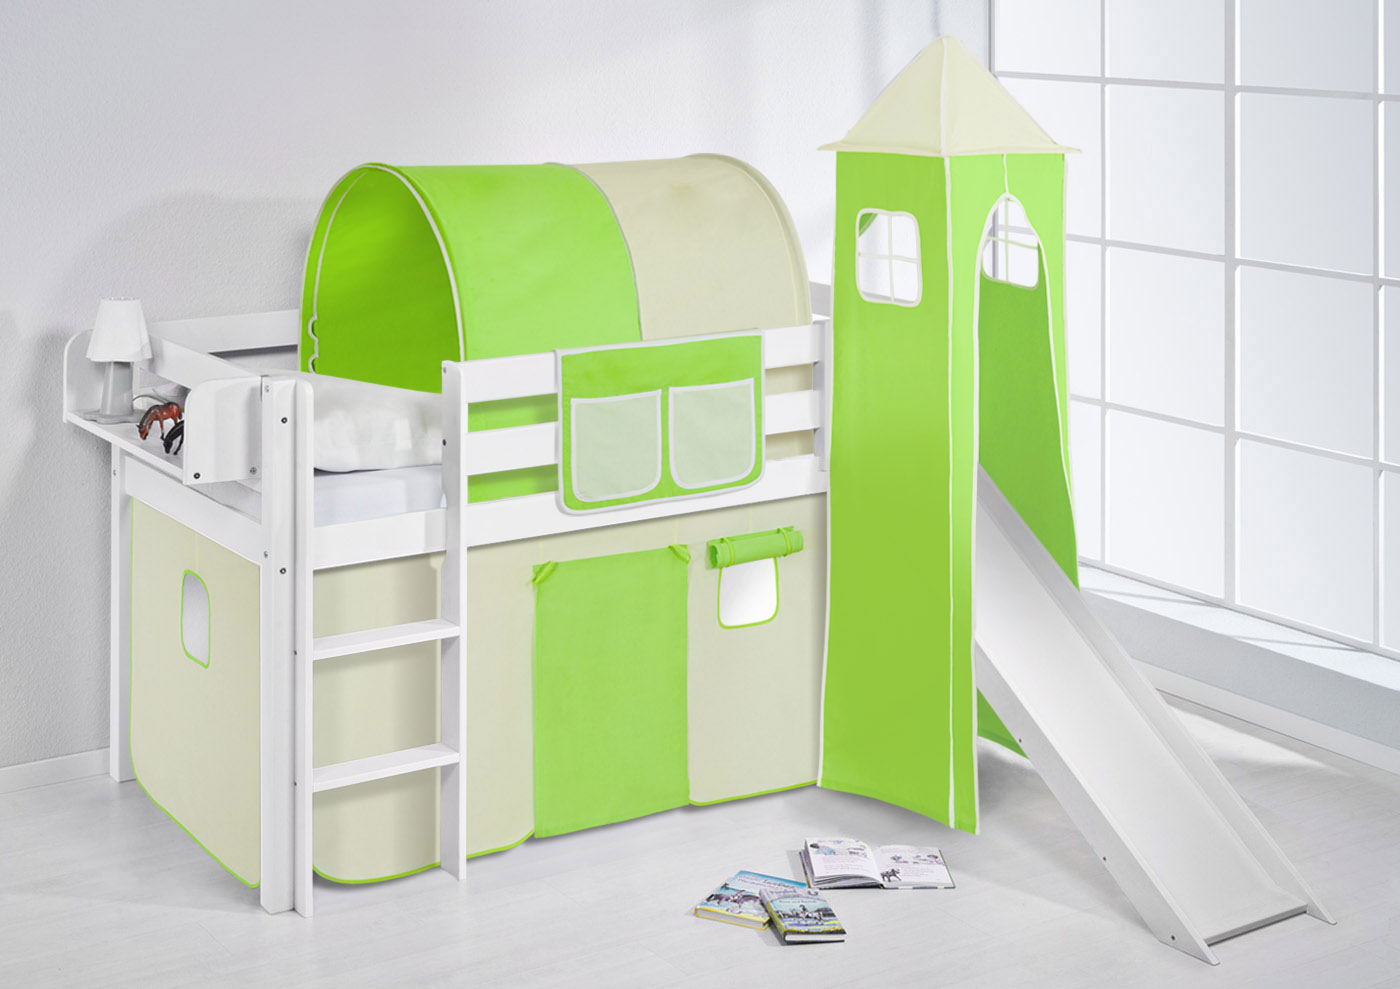 spielbett hochbett kinderbett kinder bett jelle mit turm. Black Bedroom Furniture Sets. Home Design Ideas